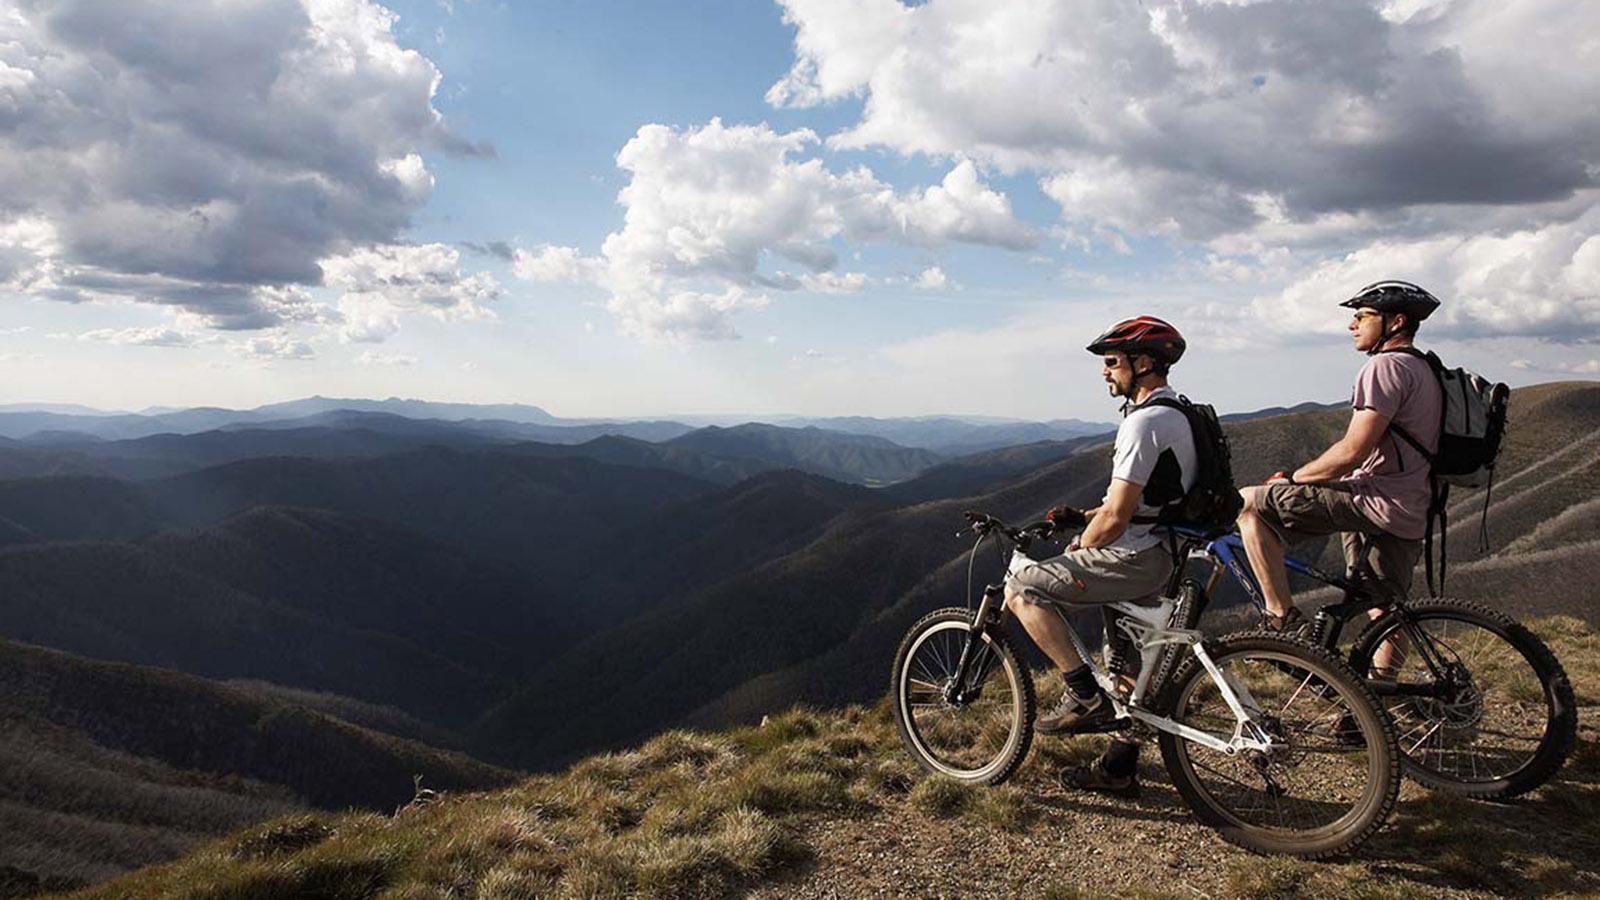 Mountain biking at Mount Hotham, High Country, Victoria, Australia